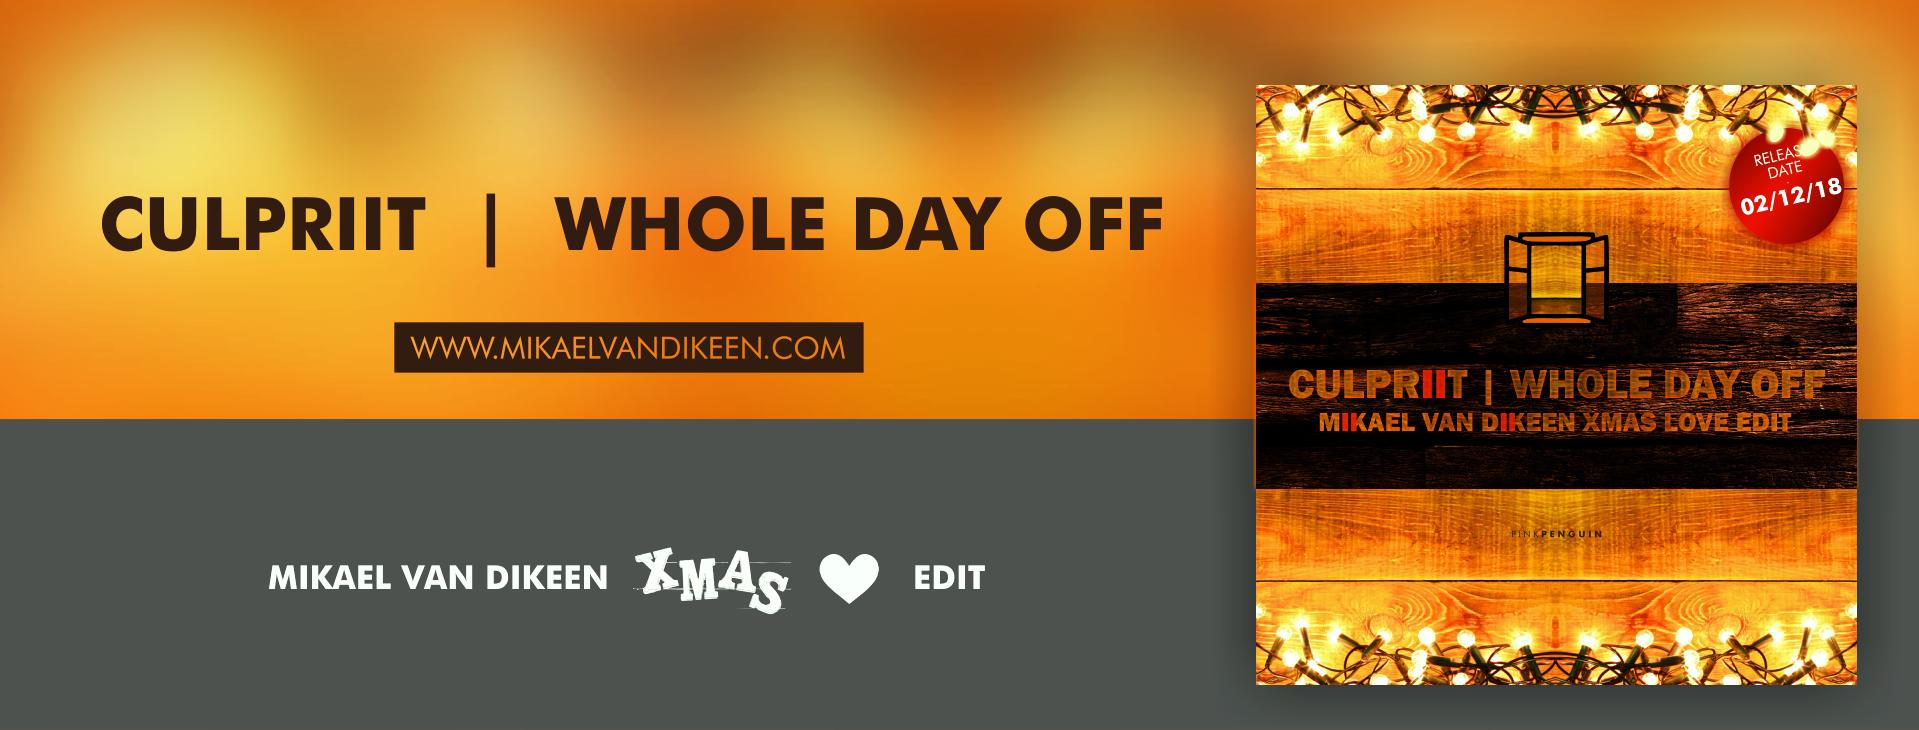 Culpriit - Whole Day Off (Mikael van Dikeen Xmas Love Edit) - head banner